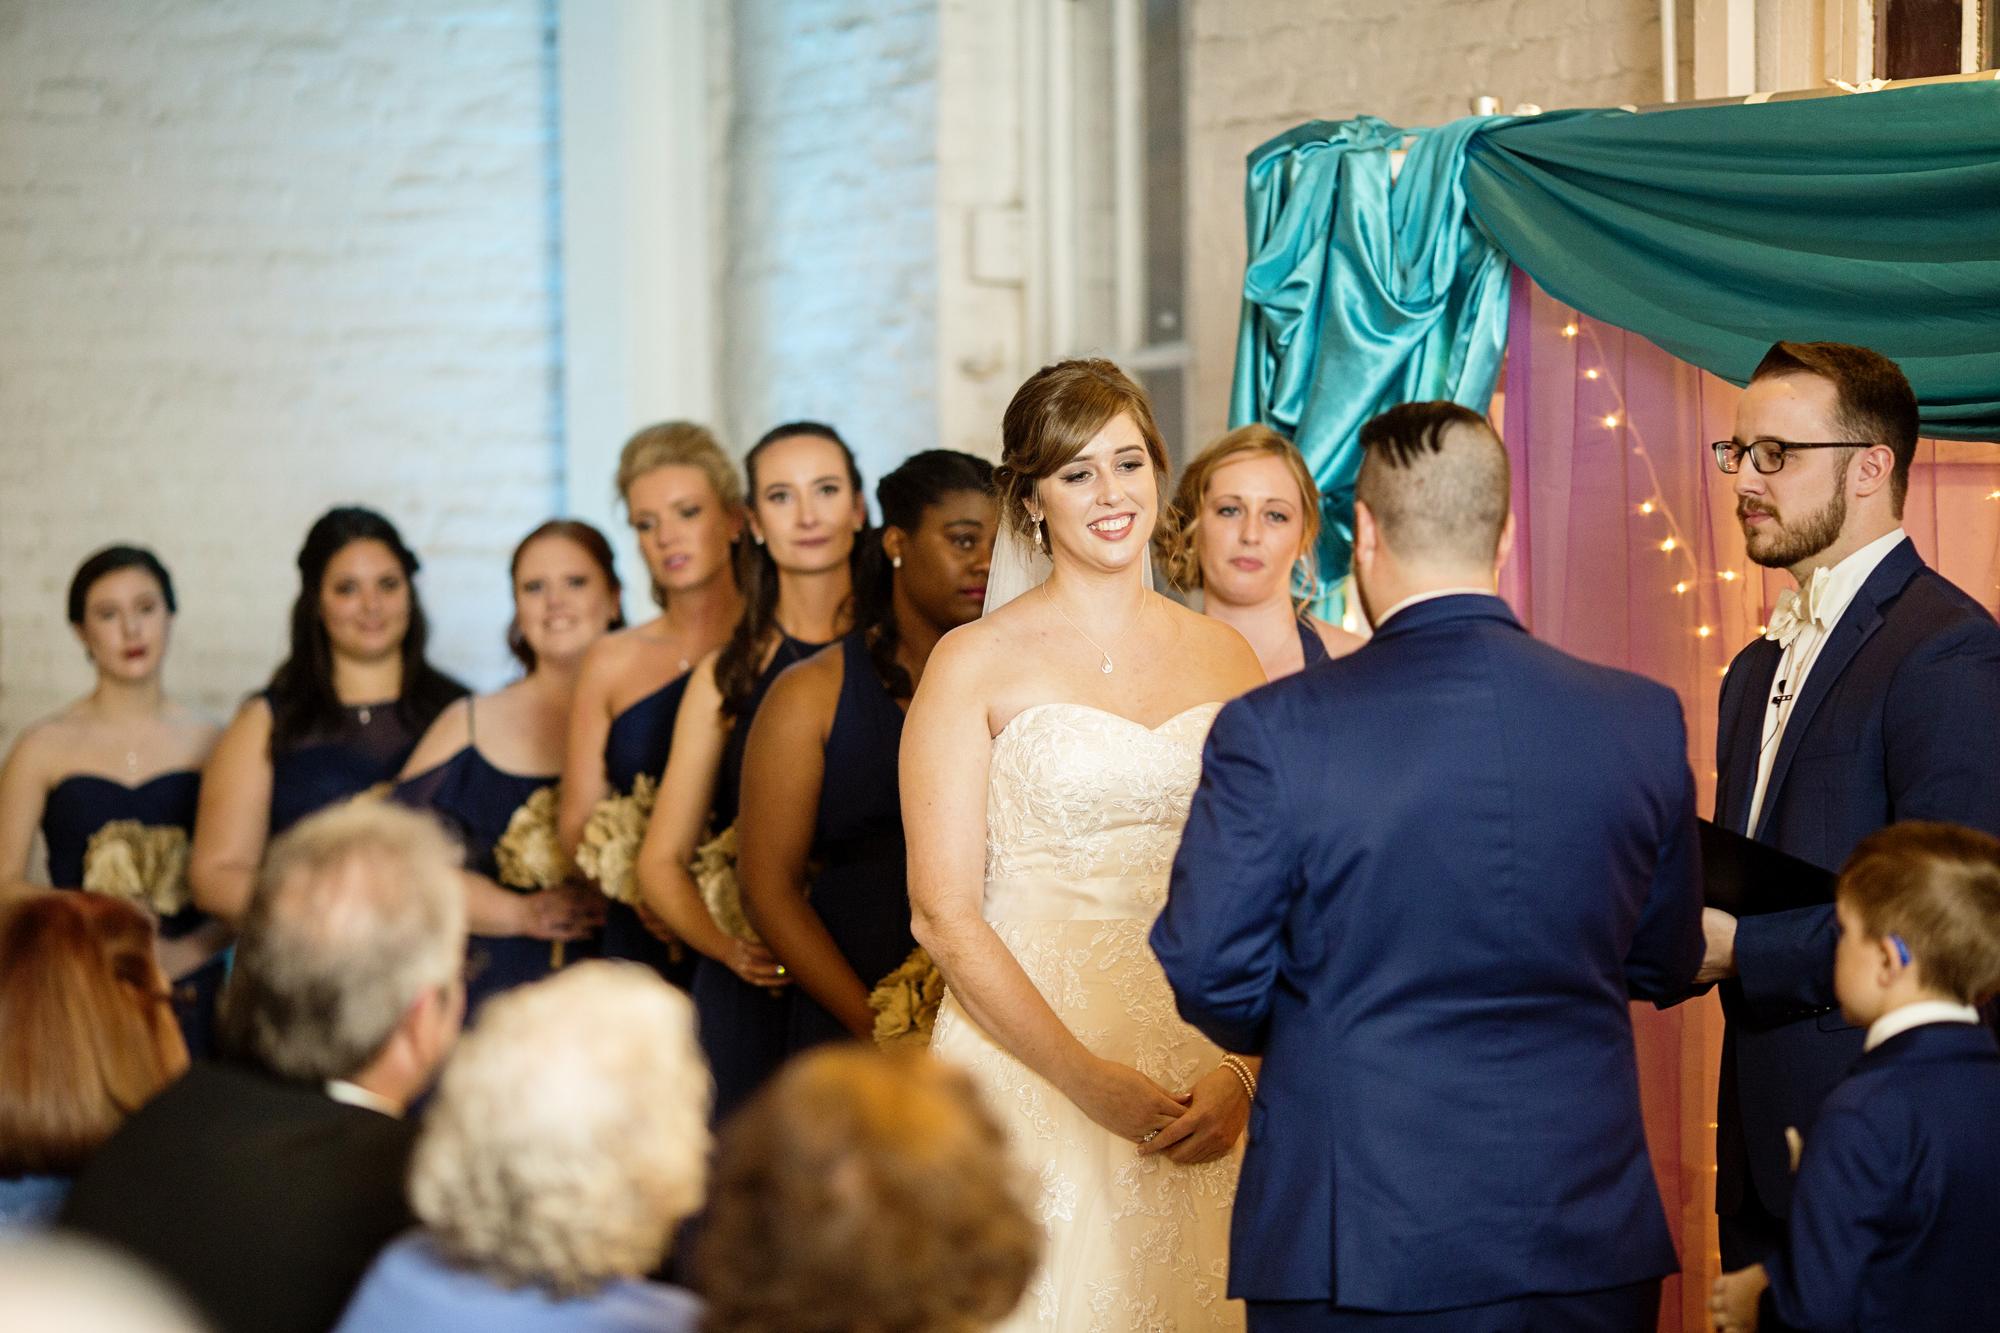 Seriously_Sabrina_Photography_Lexington_Kentucky_21c_Round_Barn_Red_Mile_Wedding_Gorley_68.jpg